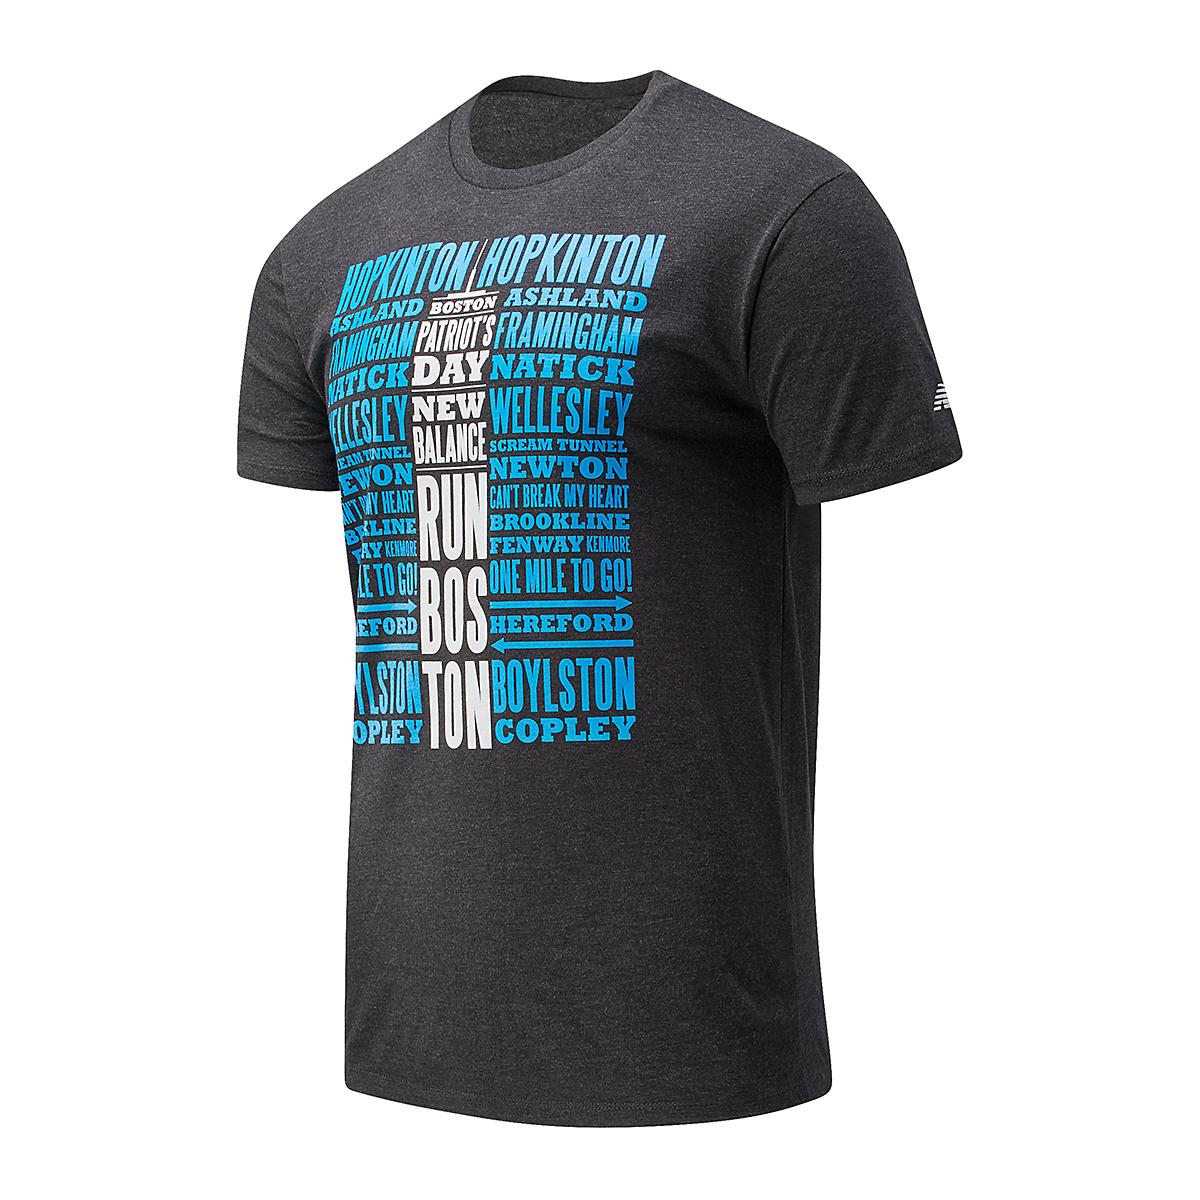 Men's New Balance Boston Graphic Short Sleeve Shirt - Color: Black - Size: S, Black, large, image 1